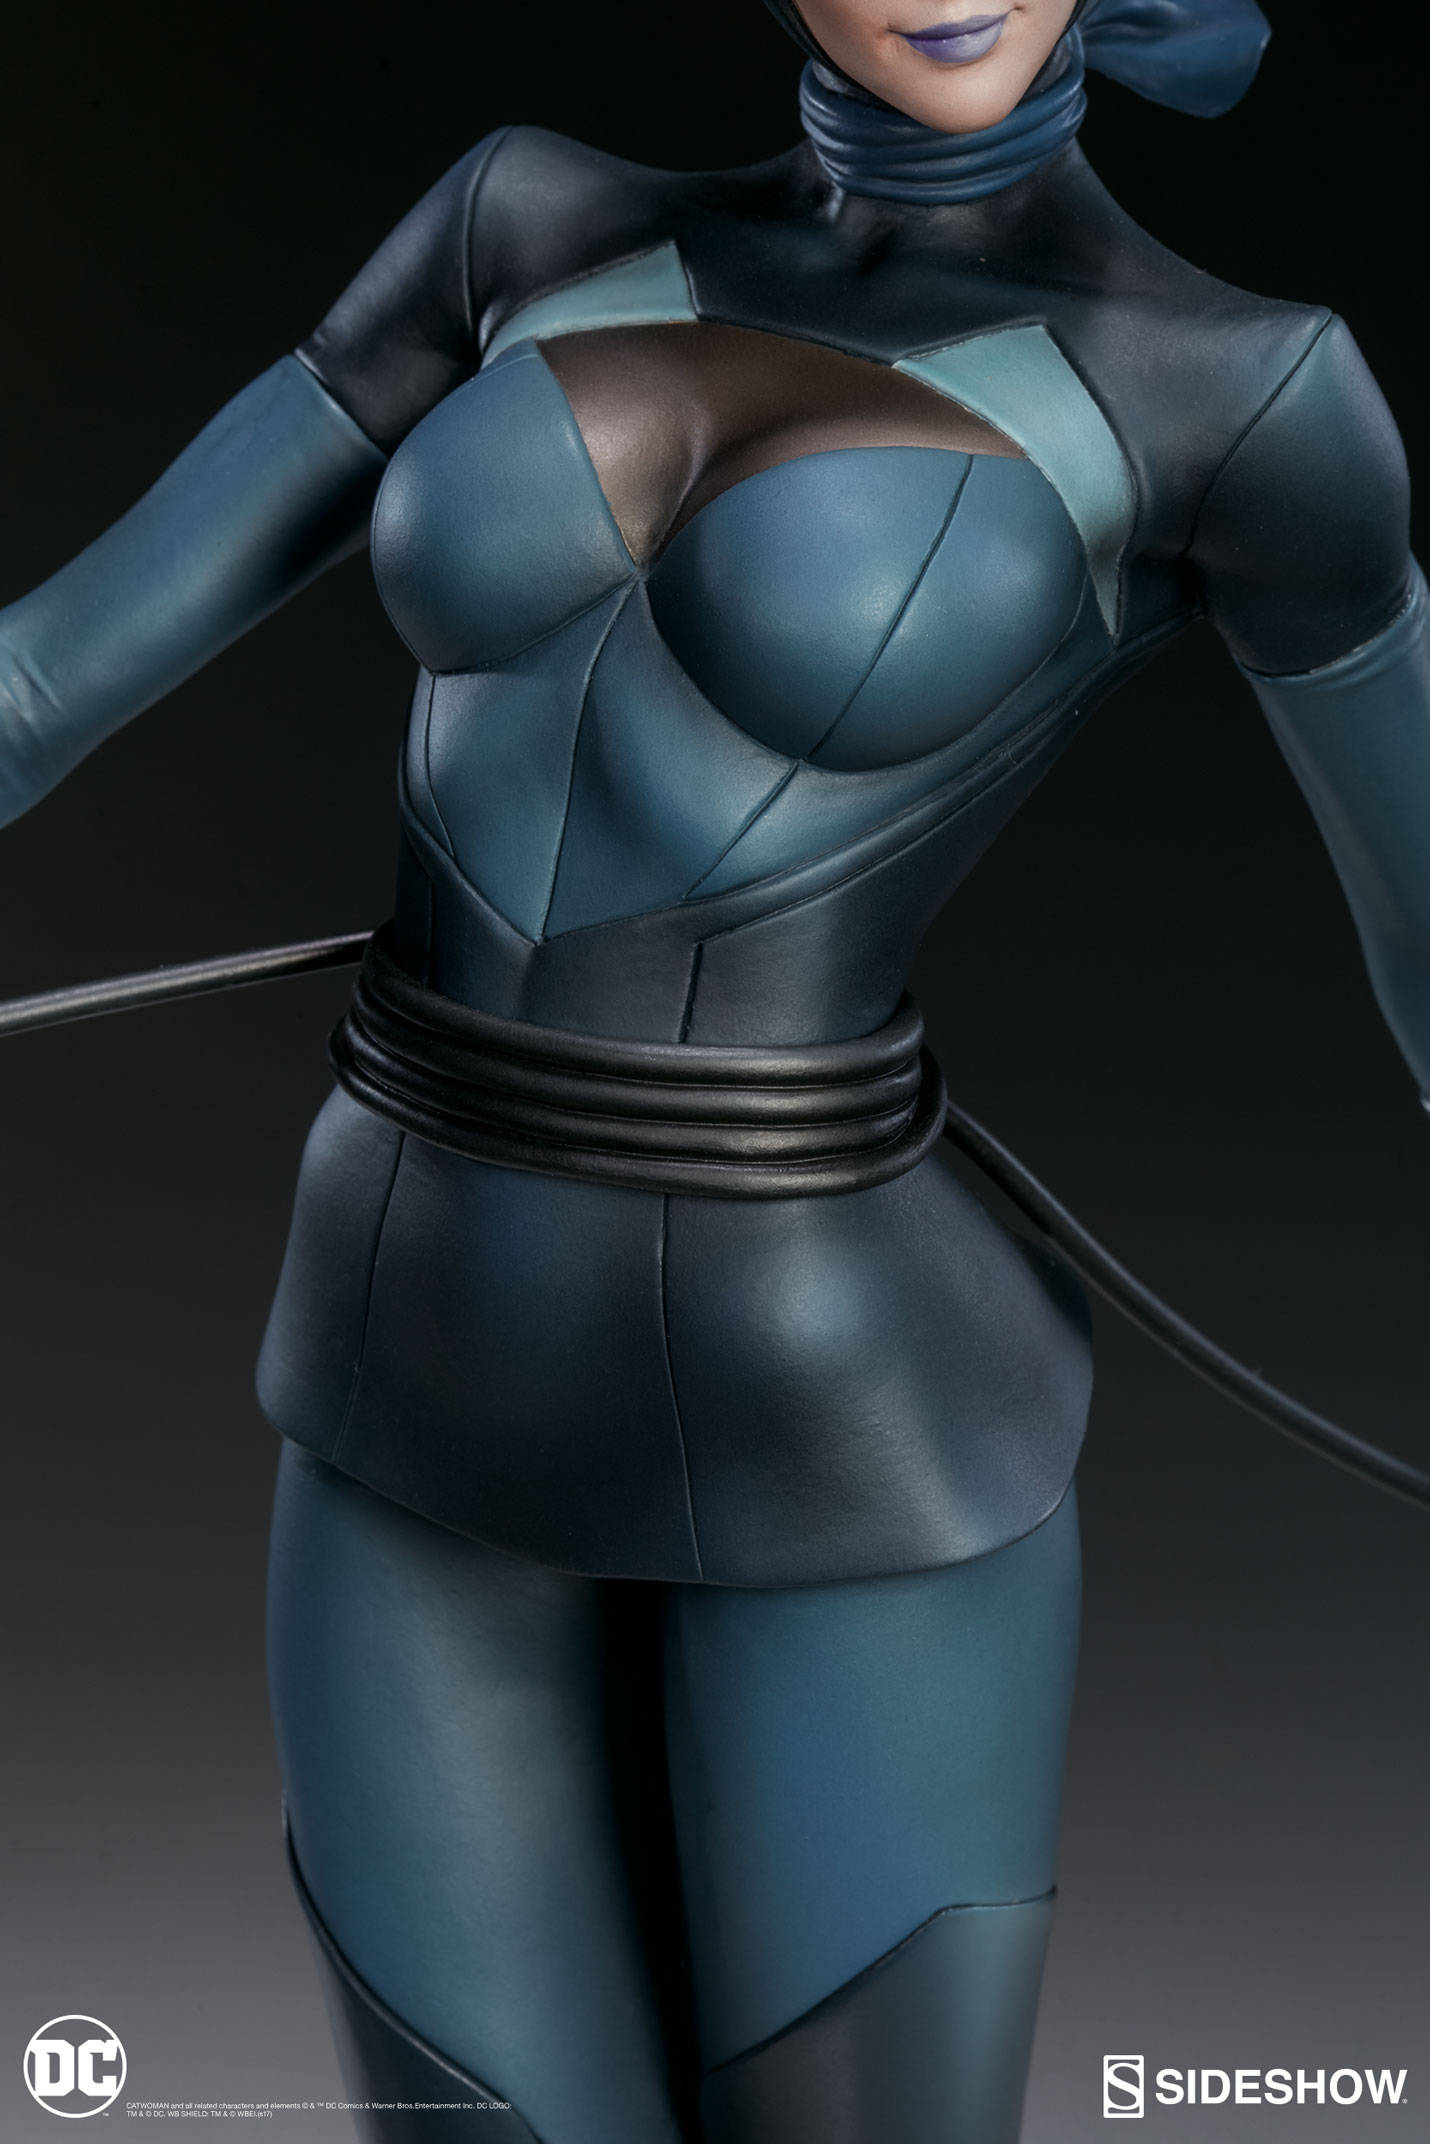 Catwoman-Sideshow-Artgerm-Statue11